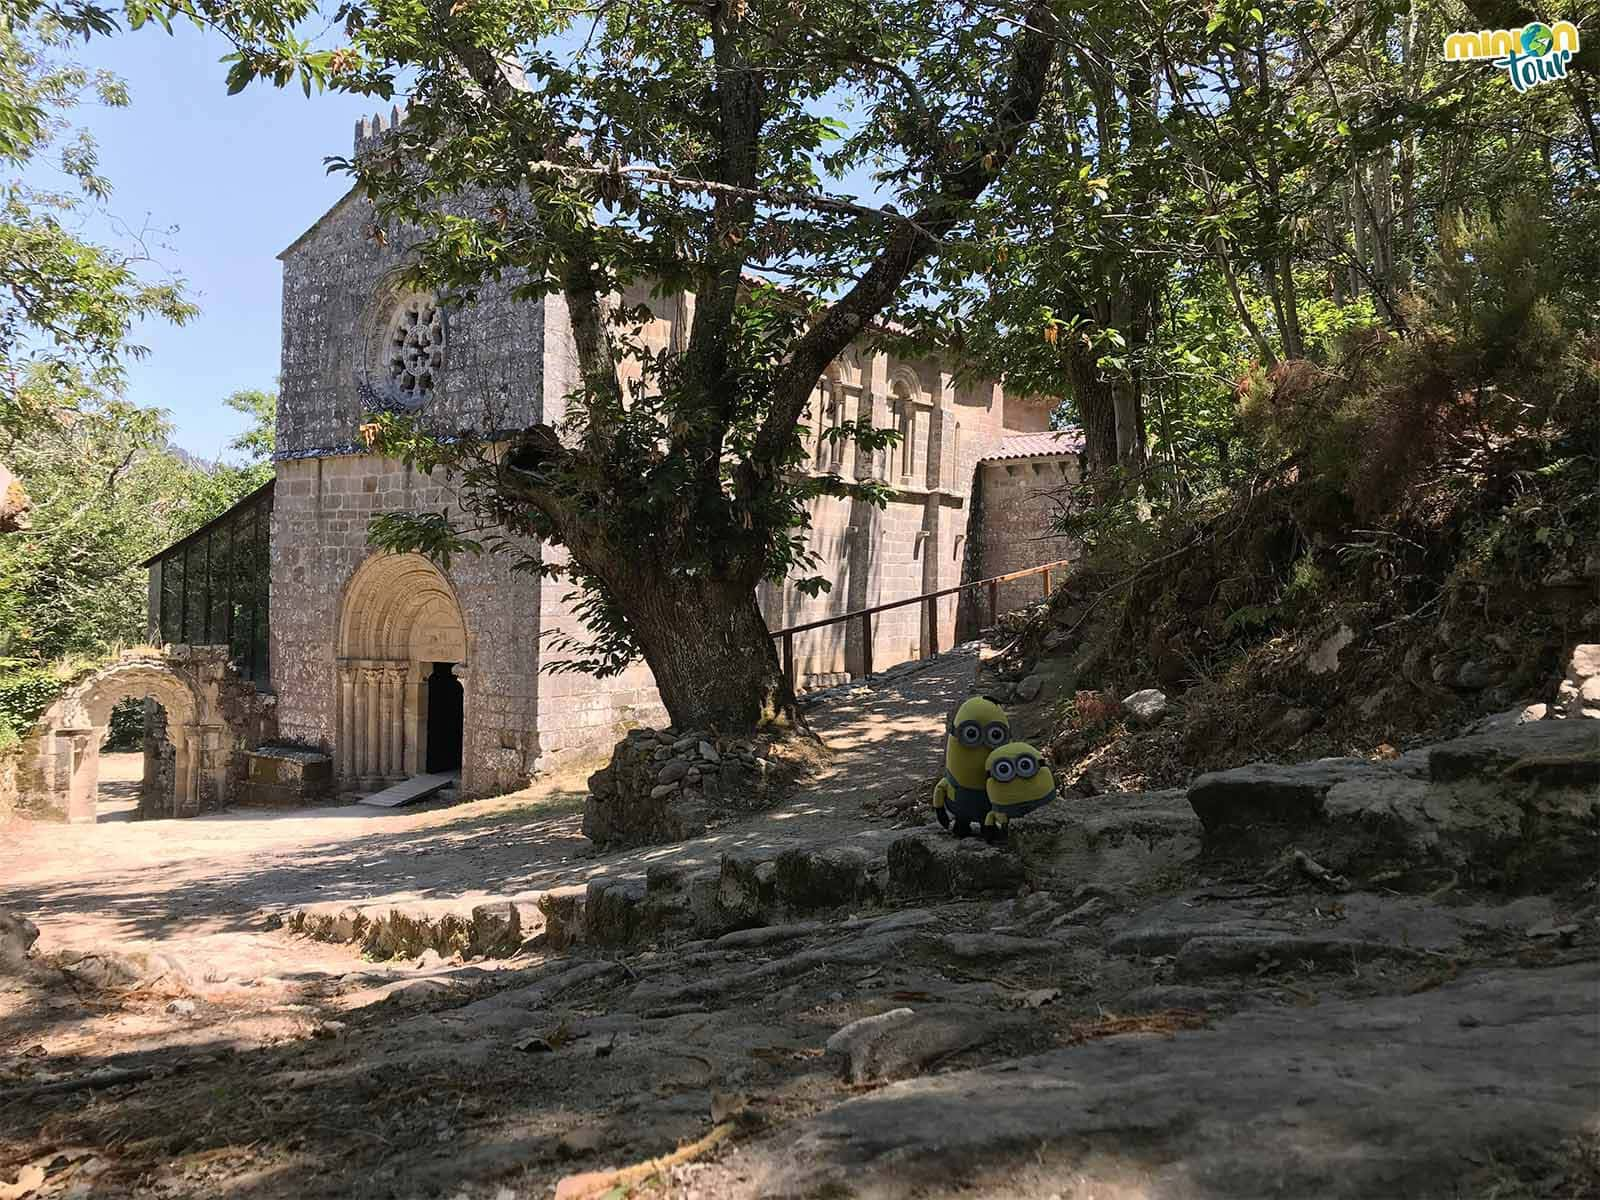 Visita al Monasterio de Santa Cristina de Ribas de Sil en Parada de Sil